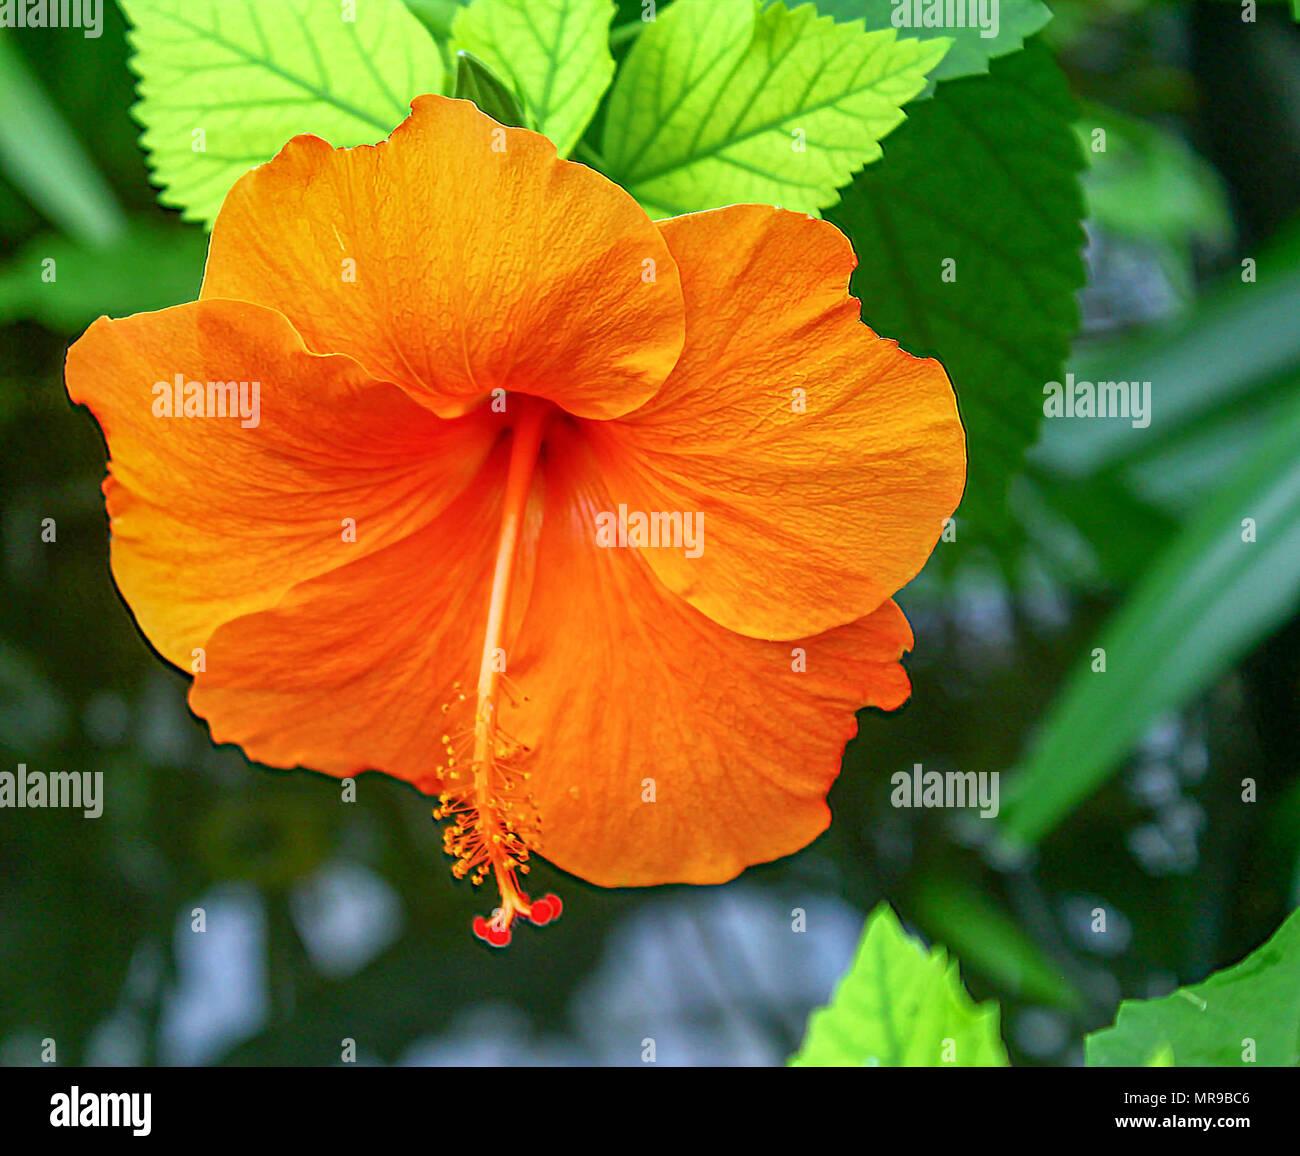 Hibiscus flower oahu hawaii stock photo 186447302 alamy hibiscus flower oahu hawaii izmirmasajfo